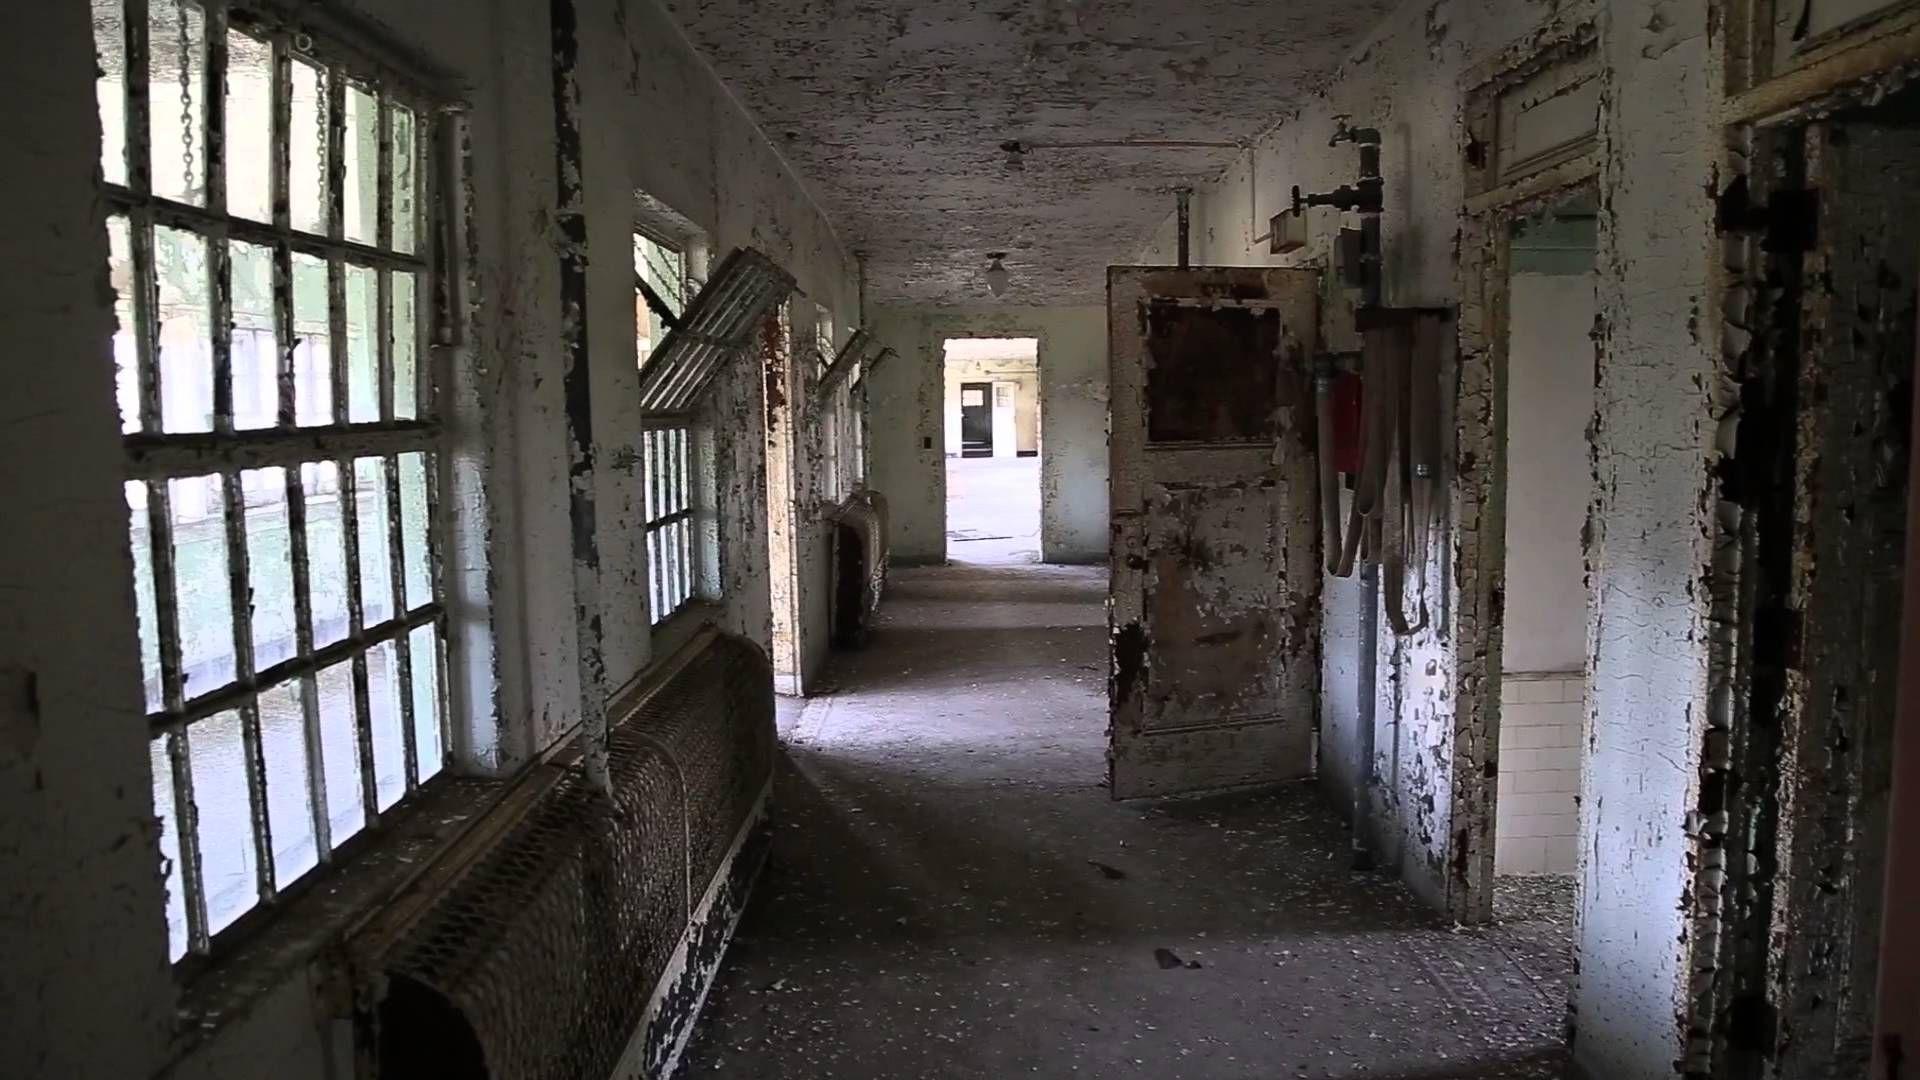 Nj Trenton New Jersey Insane Asylum Greystone Park Psychiatric Hospital All Patients Were Haunted Hospital Waverly Hills Sanatorium Most Haunted Places